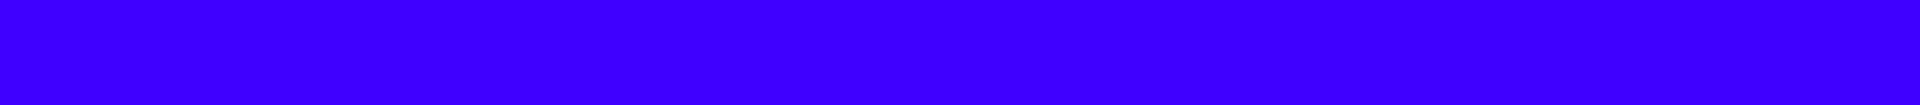 MediaCentralPlatform_1920x105